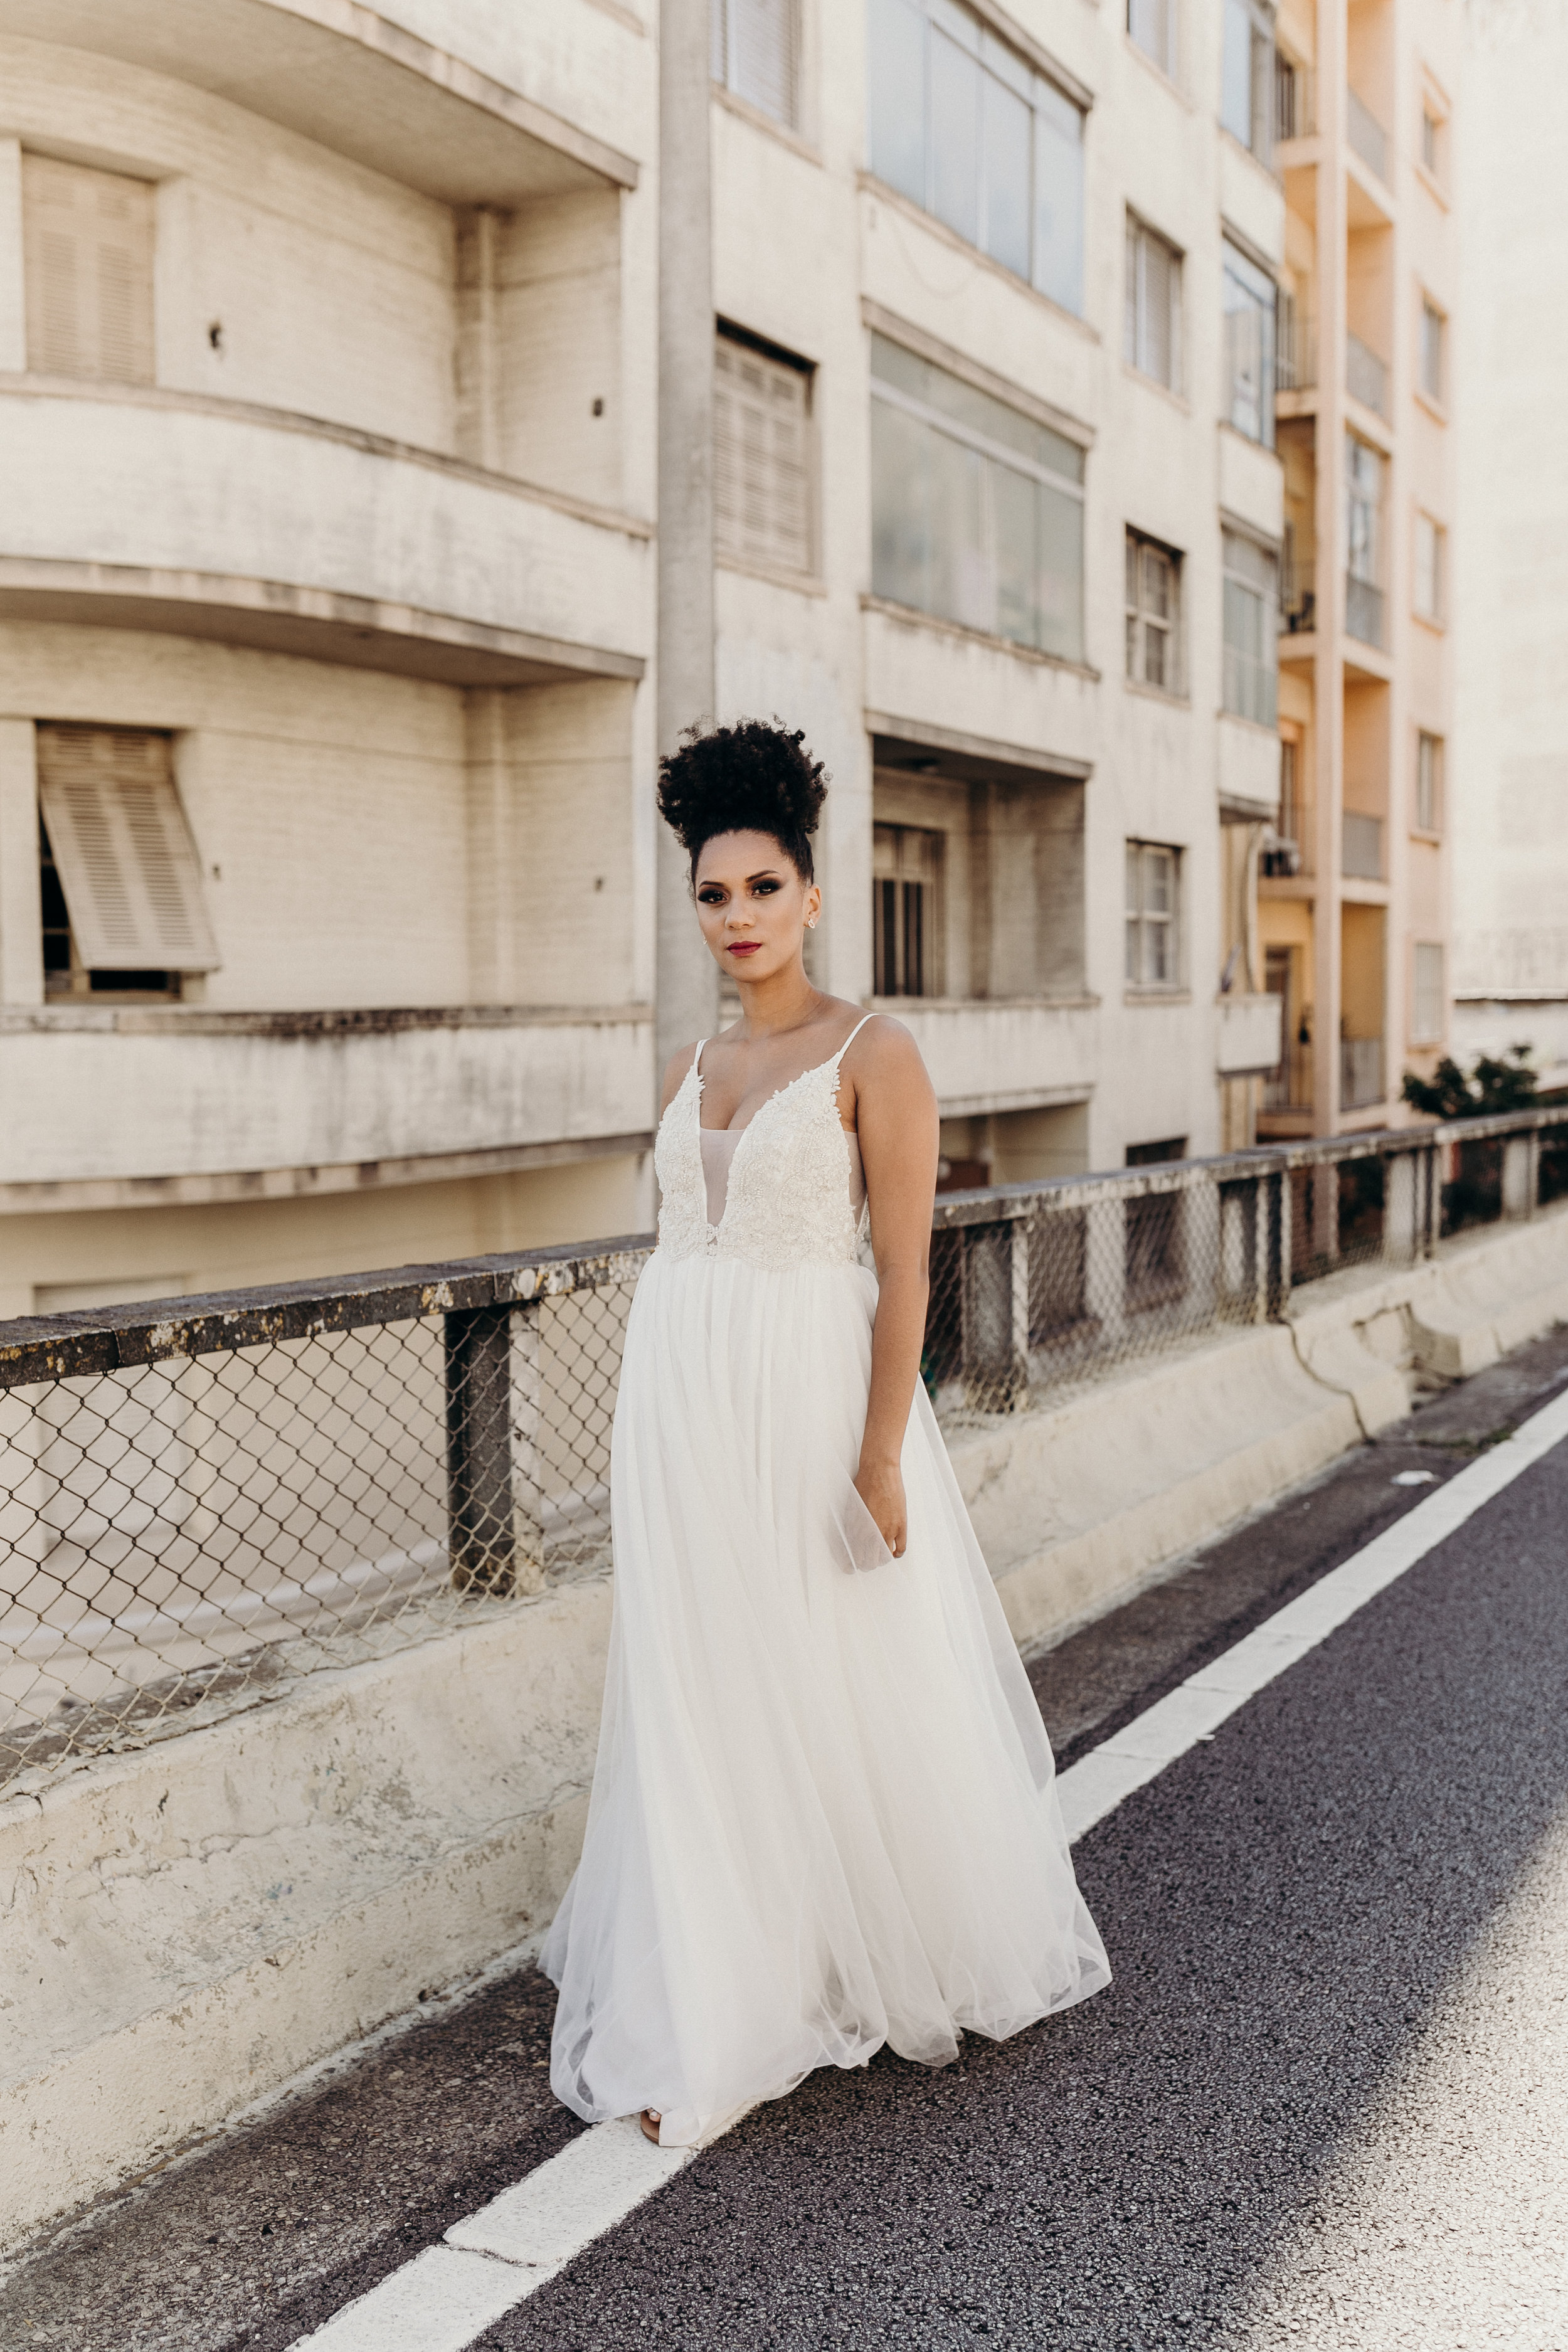 minhocao editorial - Victoria Bonvicini-252.jpg